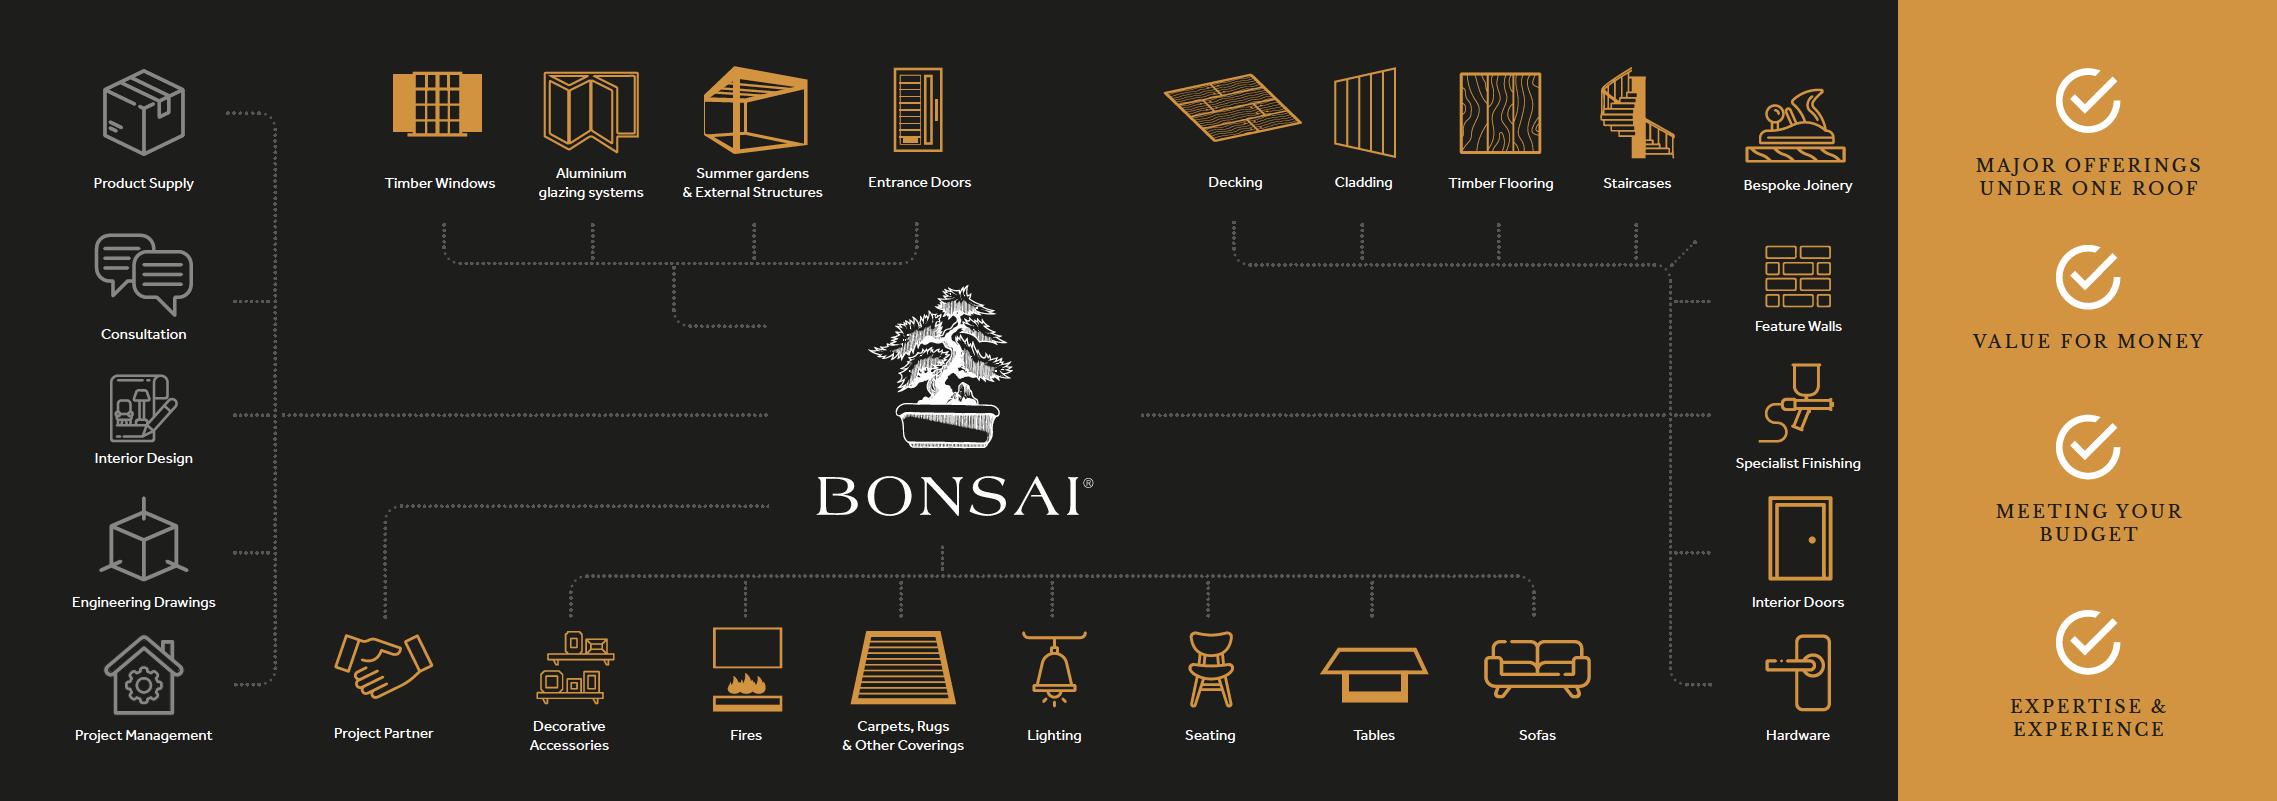 Bonsai Project Partners Infographic